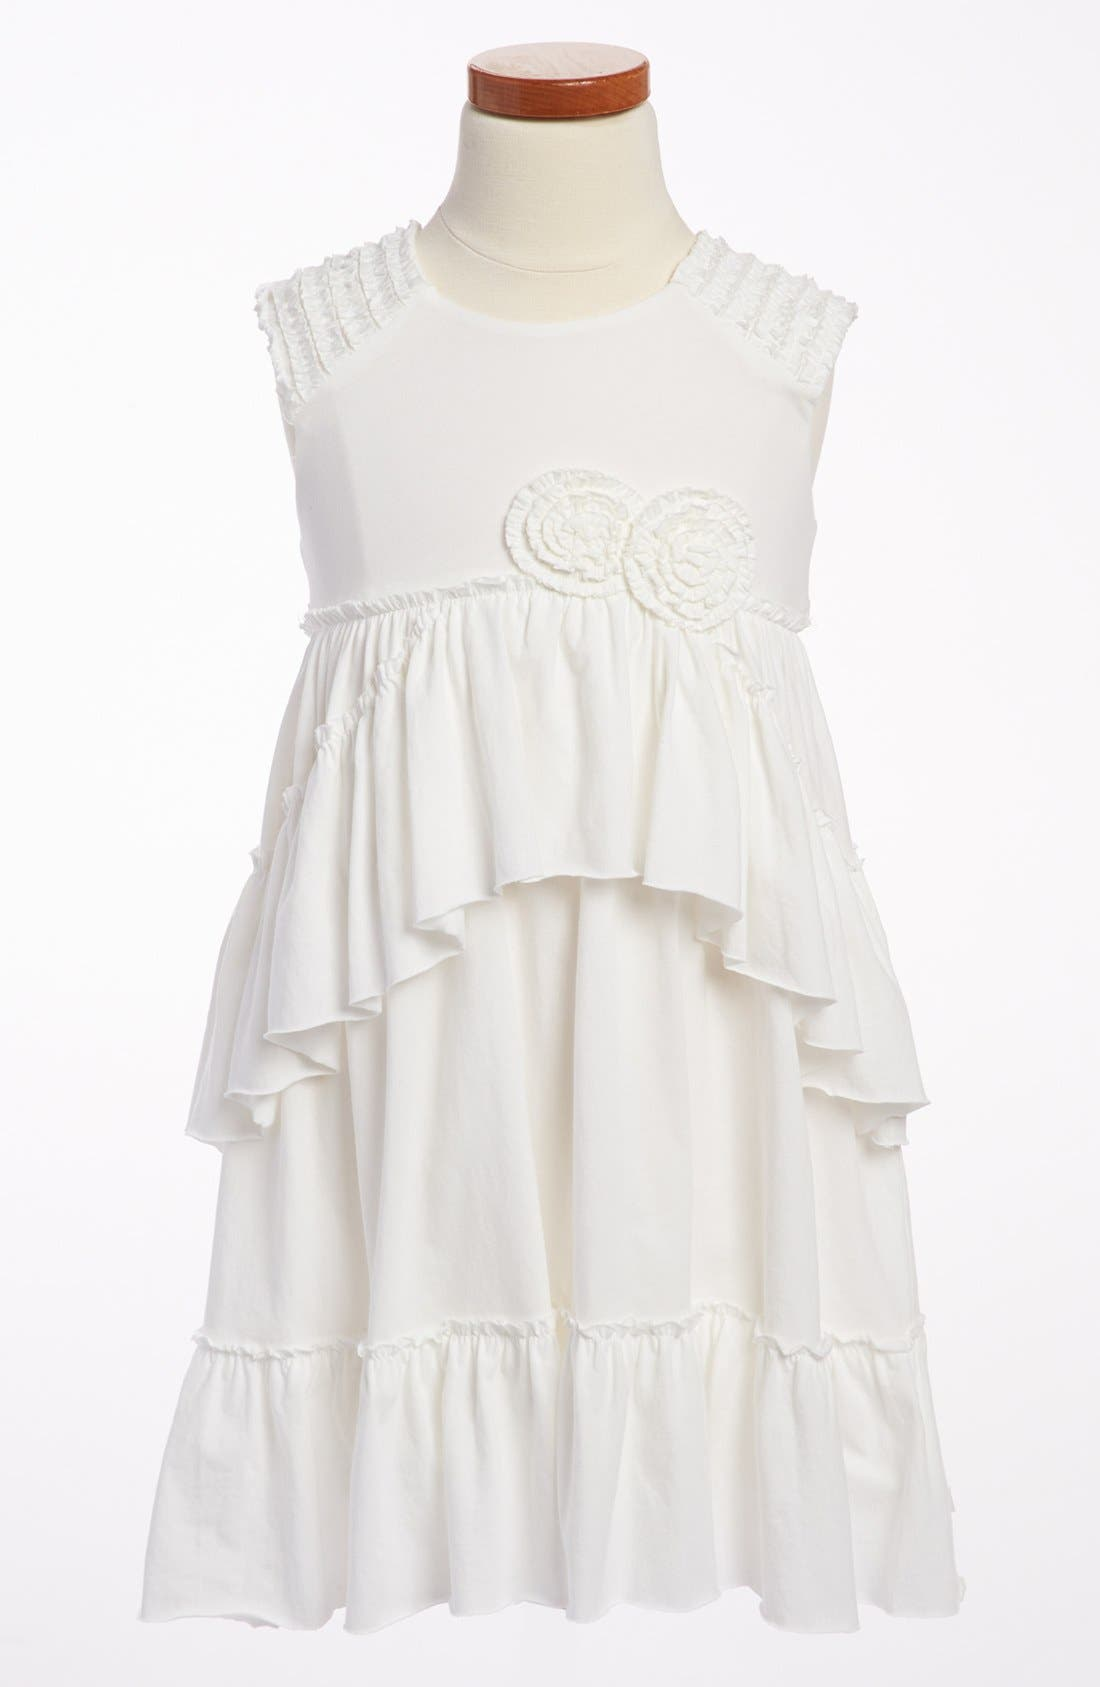 Main Image - Isobella & Chloe 'Rebecca' Ruffle Dress (Little Girls & Big Girls)